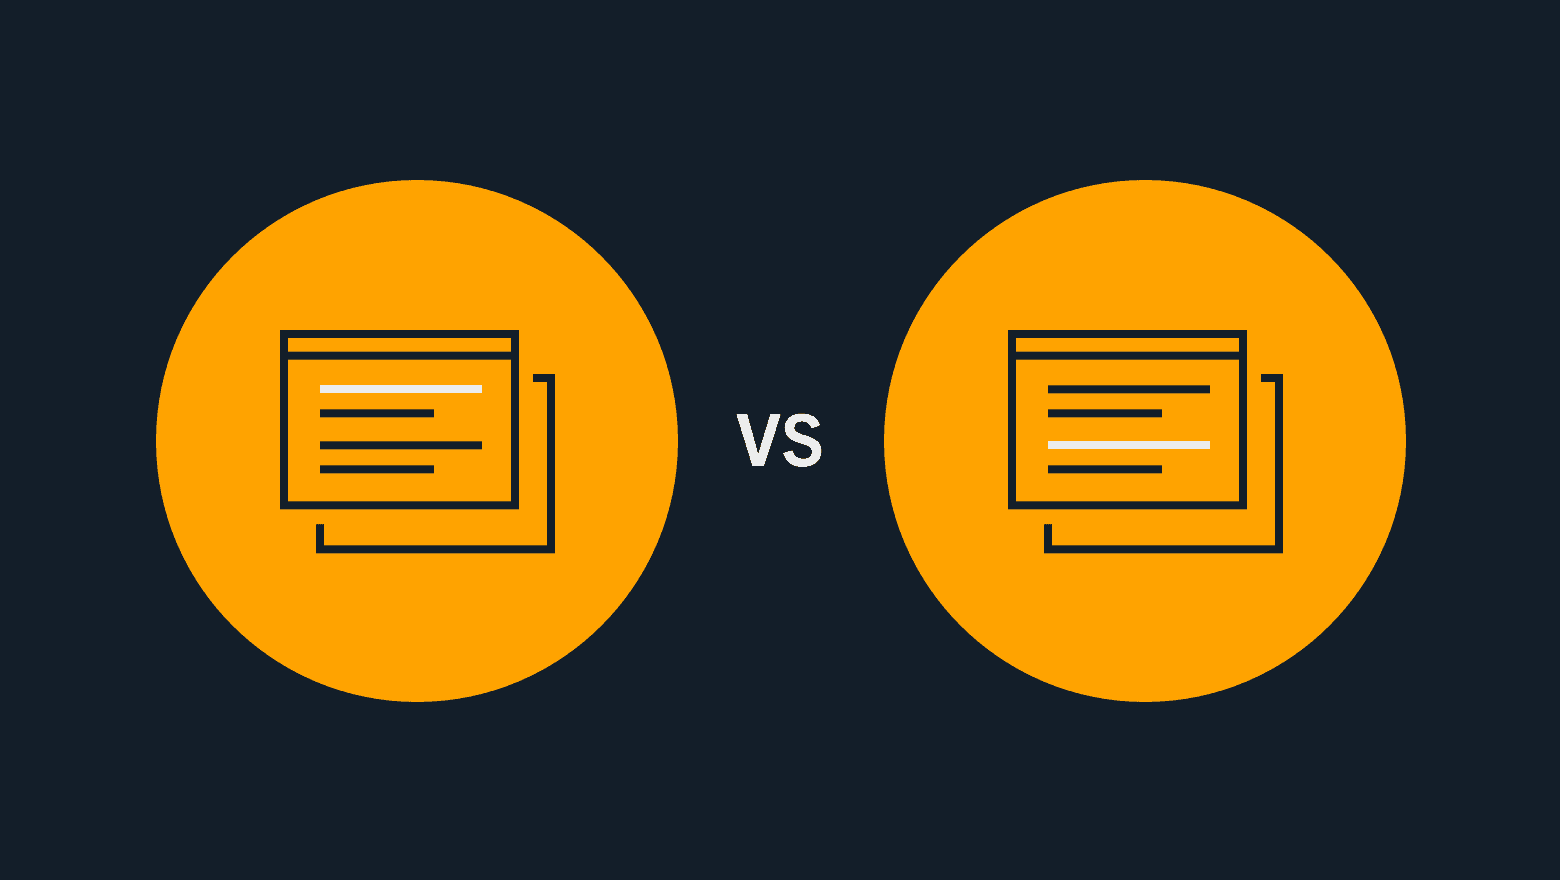 copy testing icon